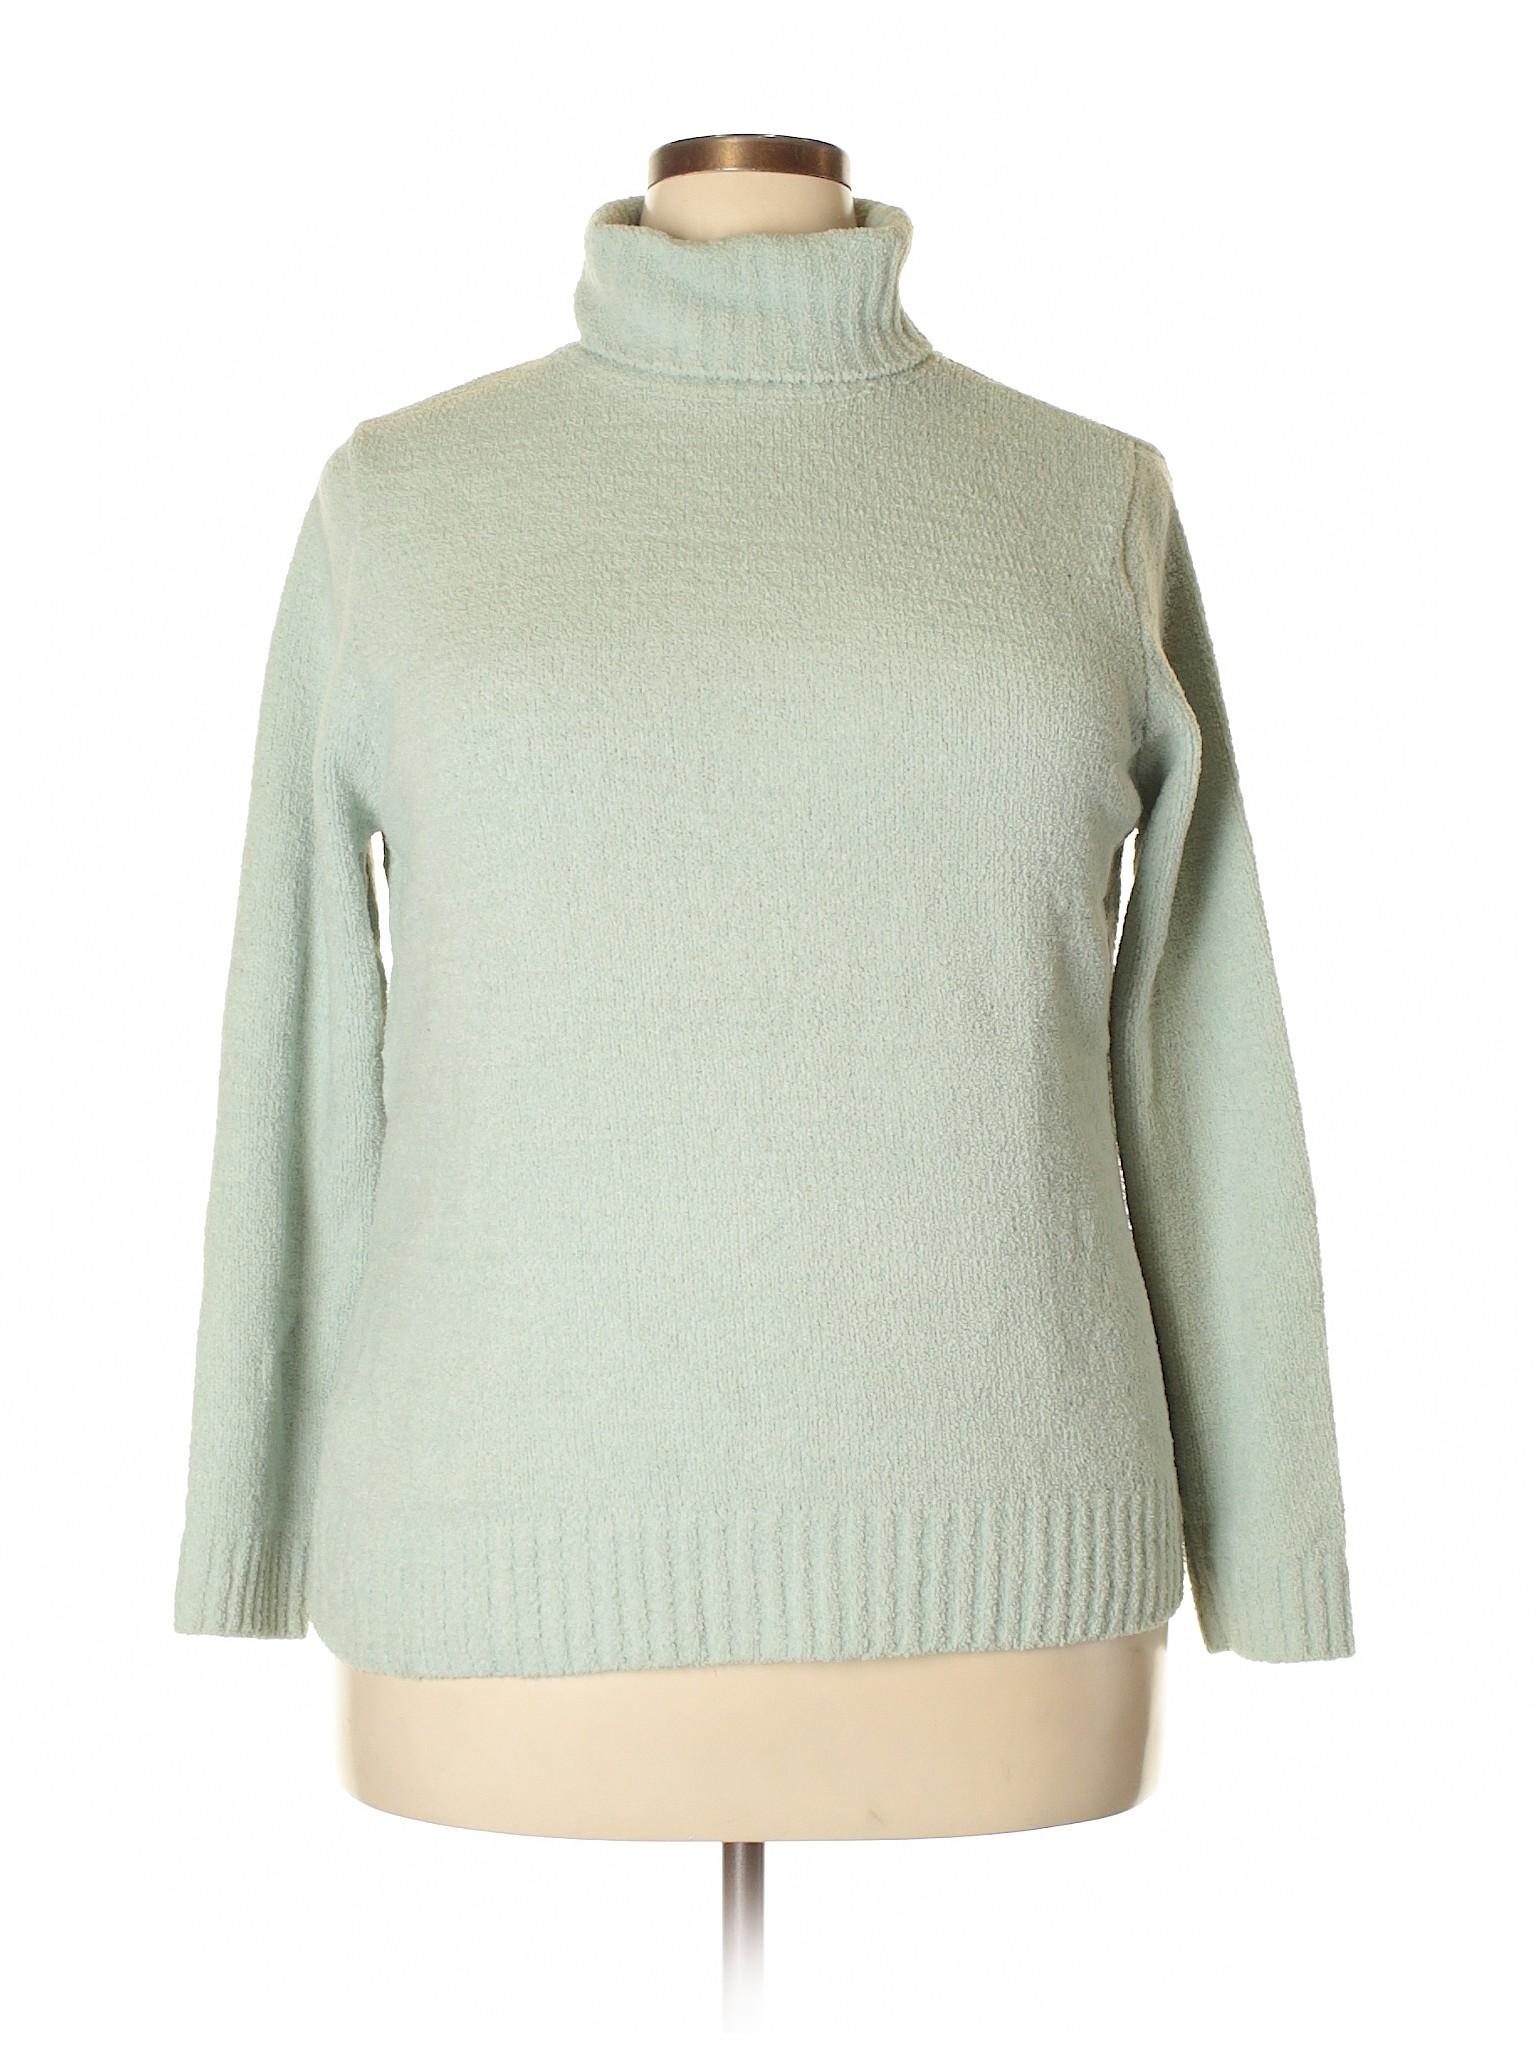 Sweater style SONOMA Turtleneck life Boutique vfzwIP